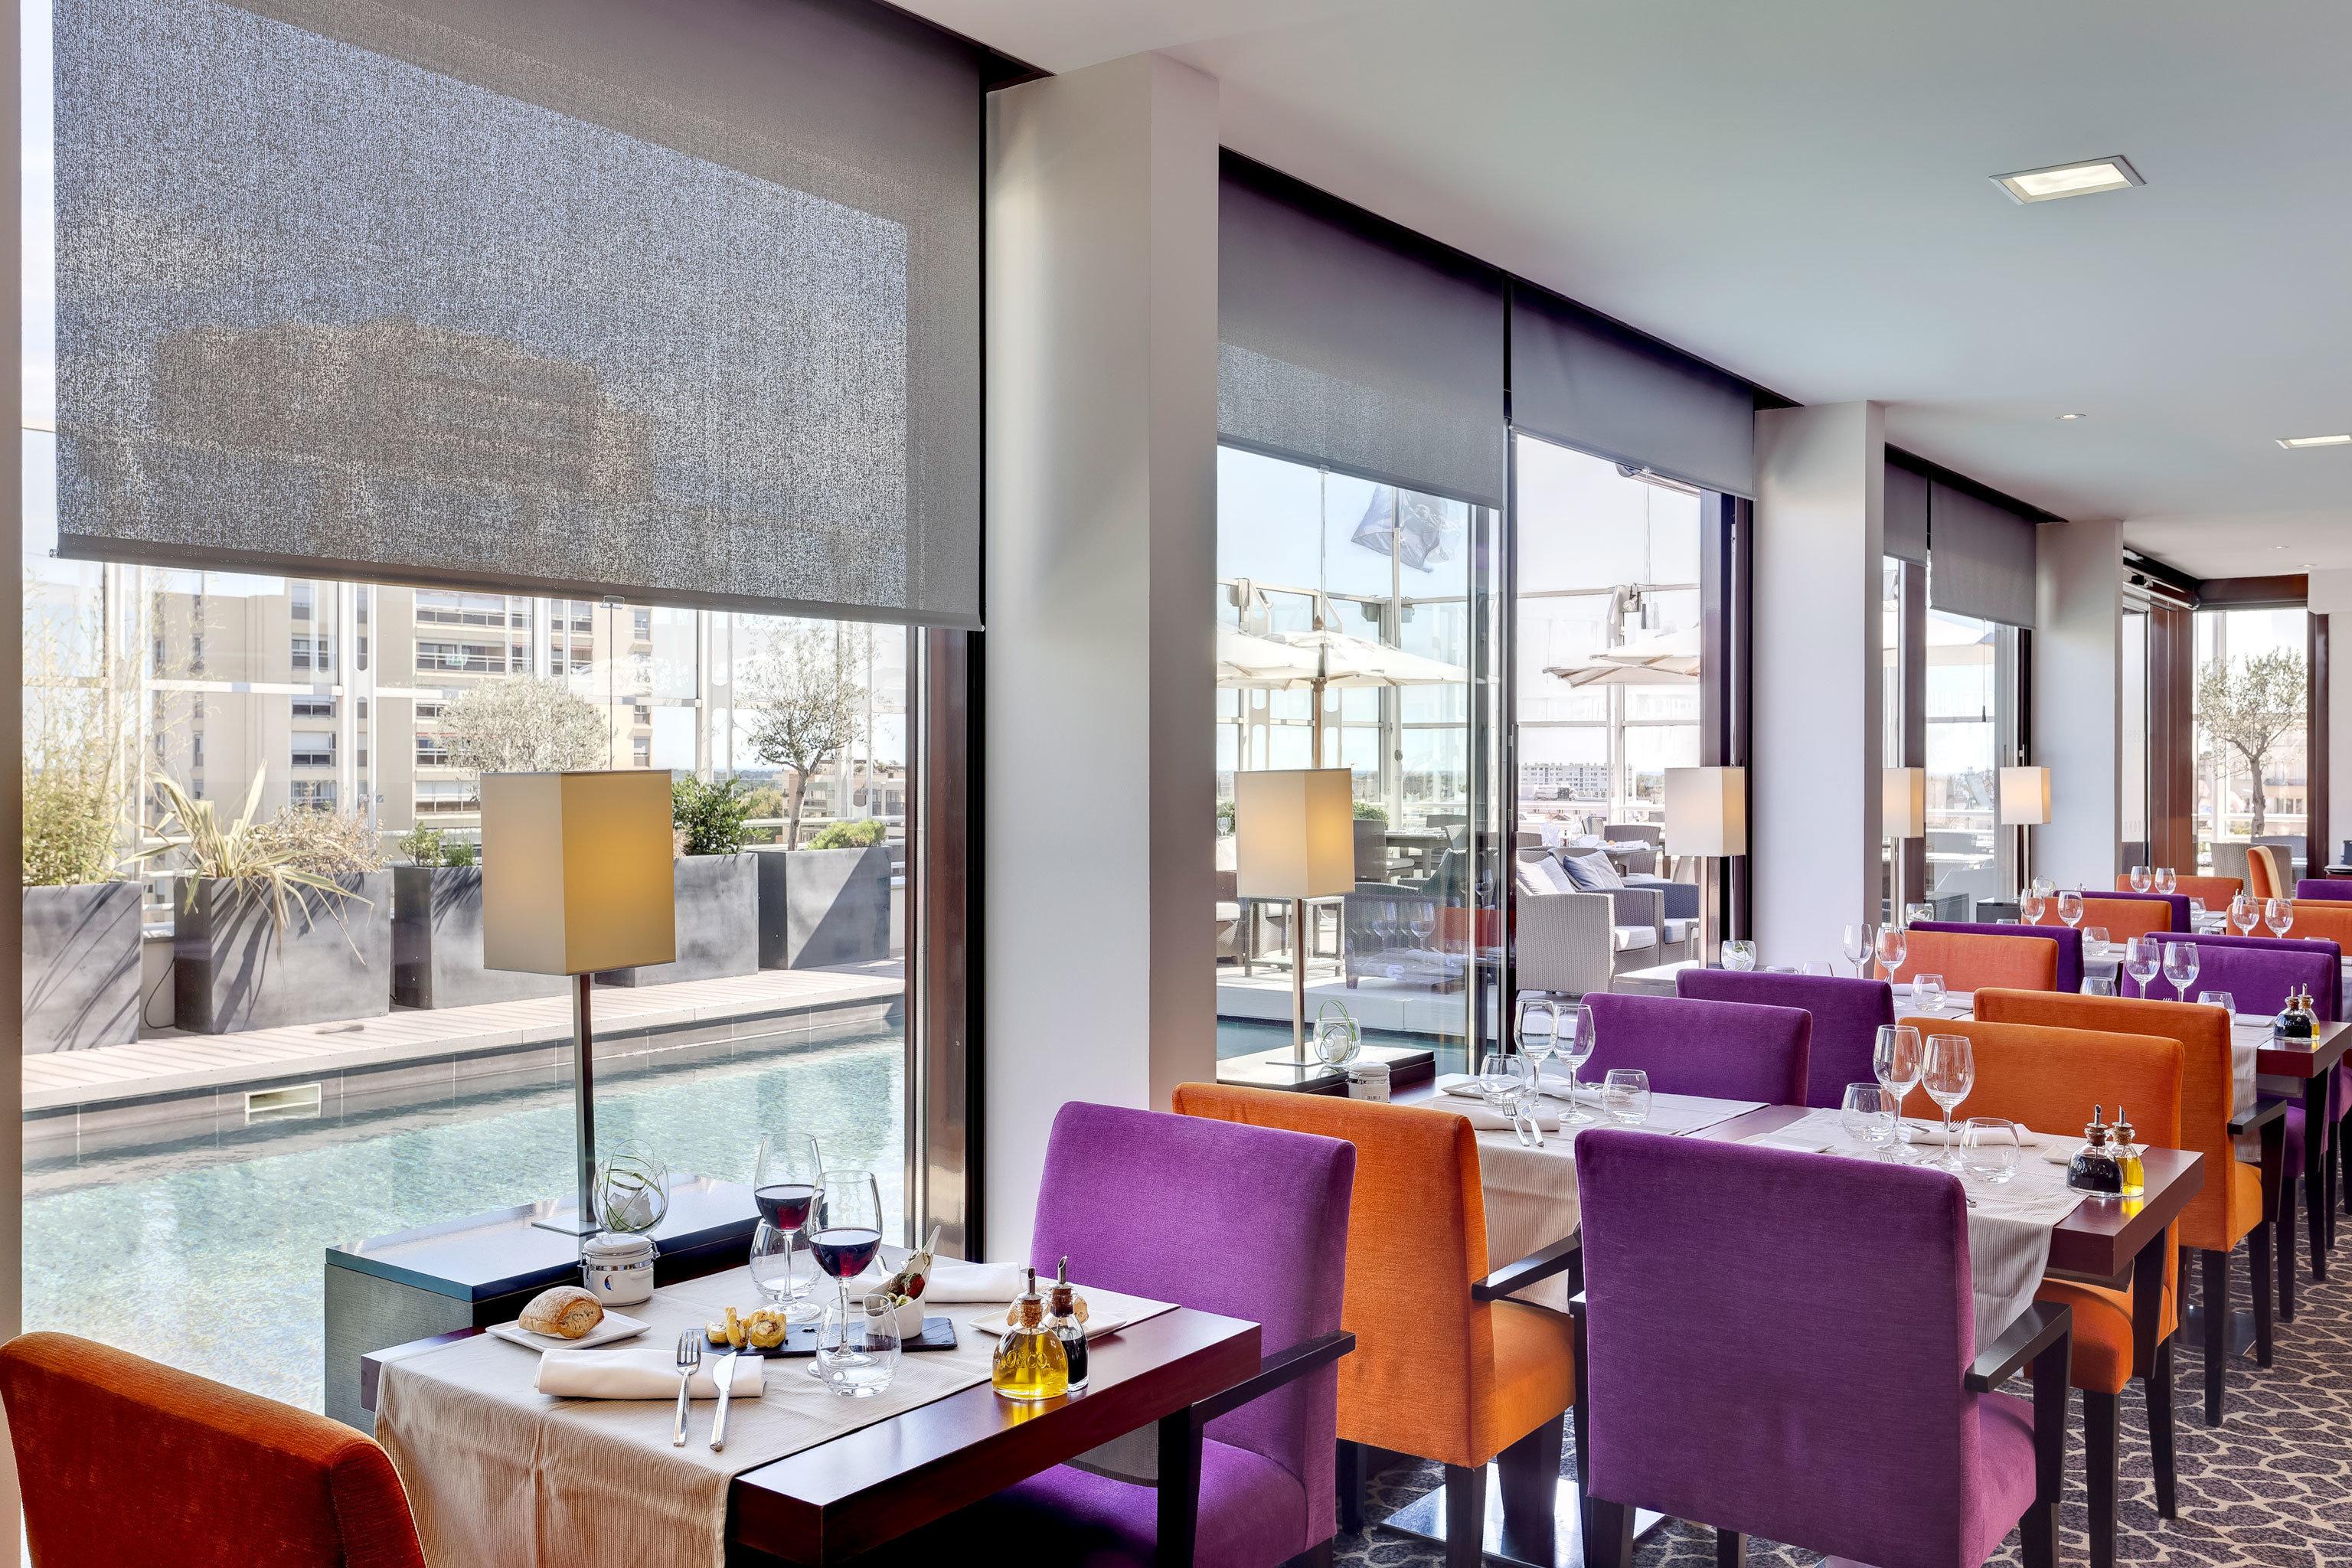 Classic Dining Drink Eat Resort chair property living room condominium restaurant